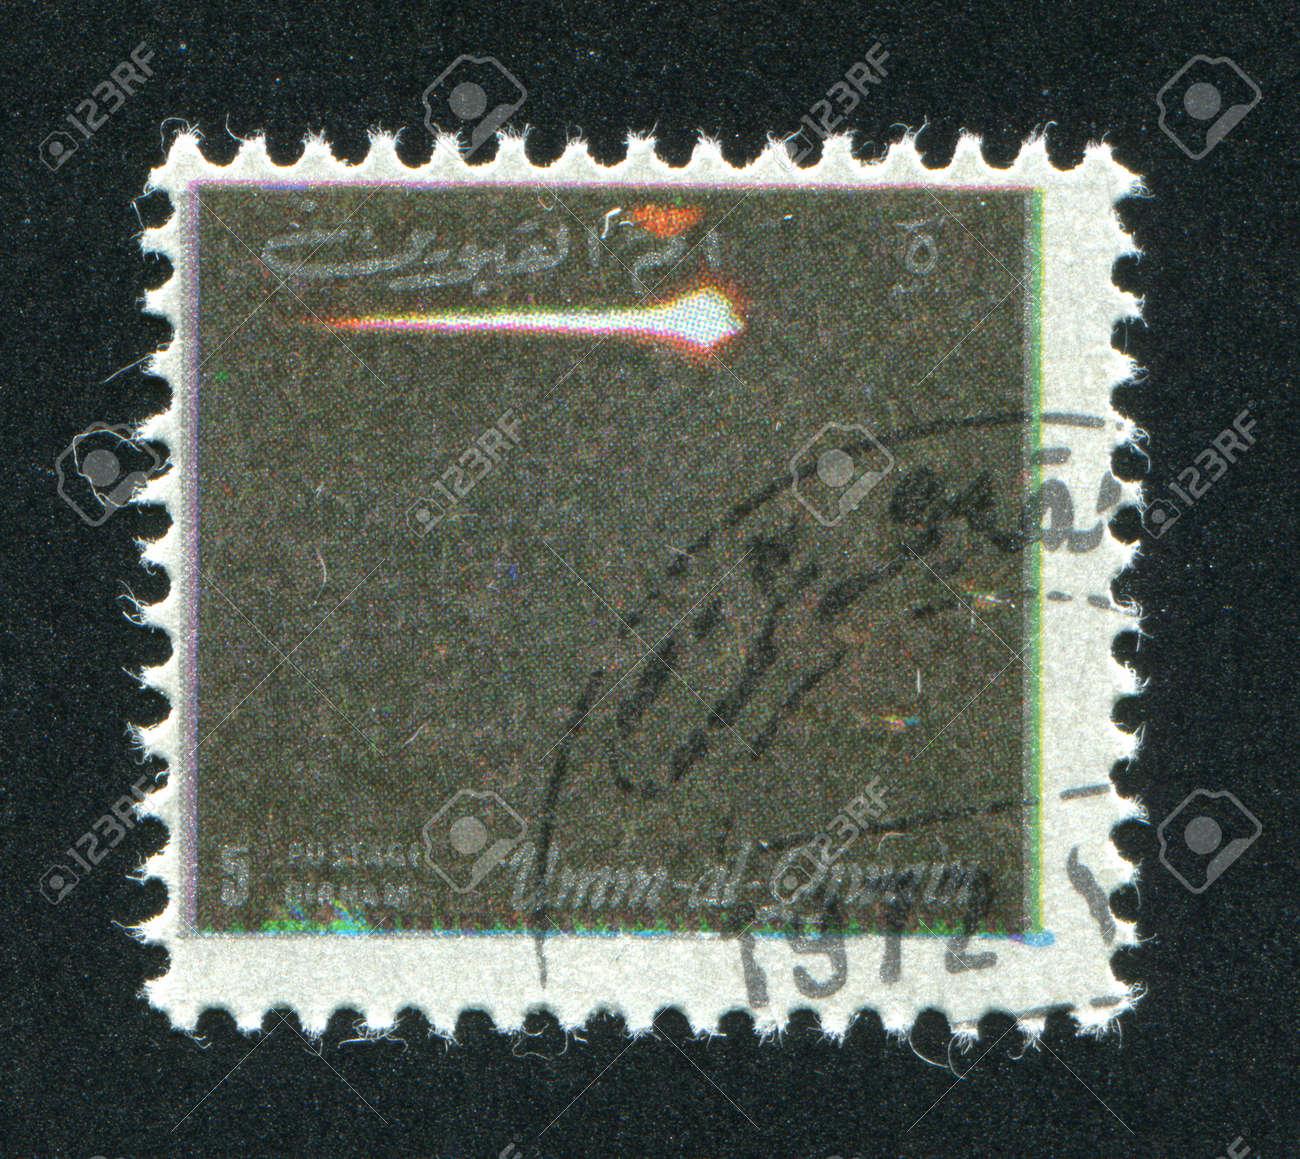 UMM AL-QUWAIN - CIRCA 1972: stamp printed by Umm al-Quwain, shows a Spaceship, circa 1972 Stock Photo - 17145669